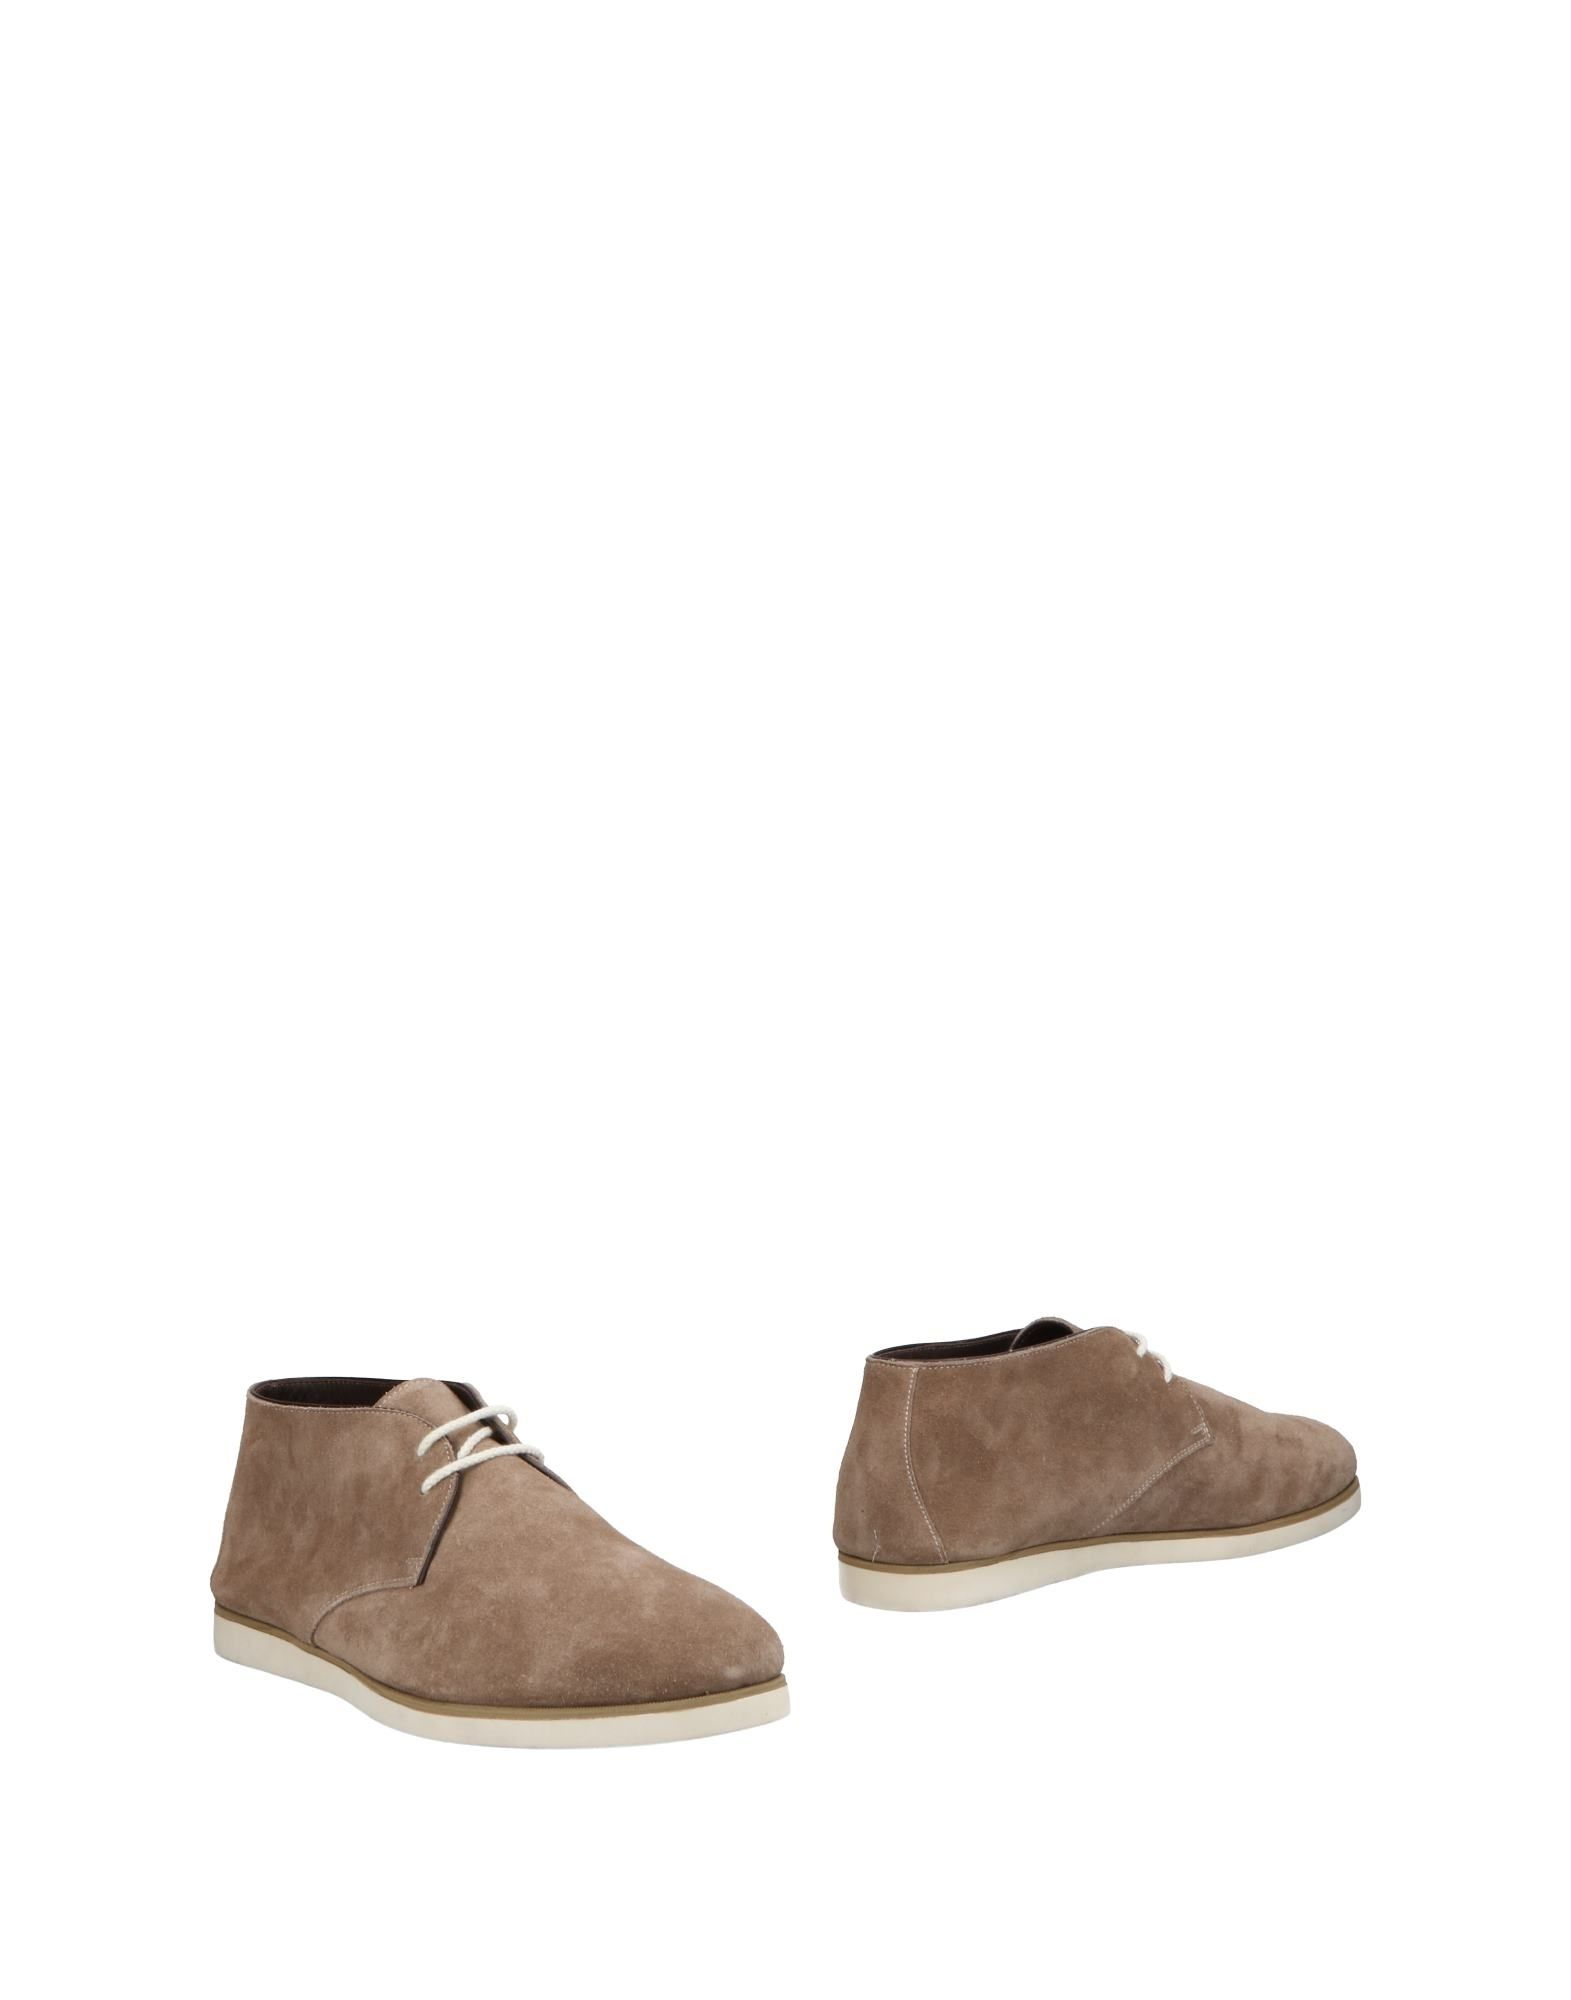 Pellettieri Di  Parma Stiefelette Herren  11507968TA Gute Qualität beliebte Schuhe